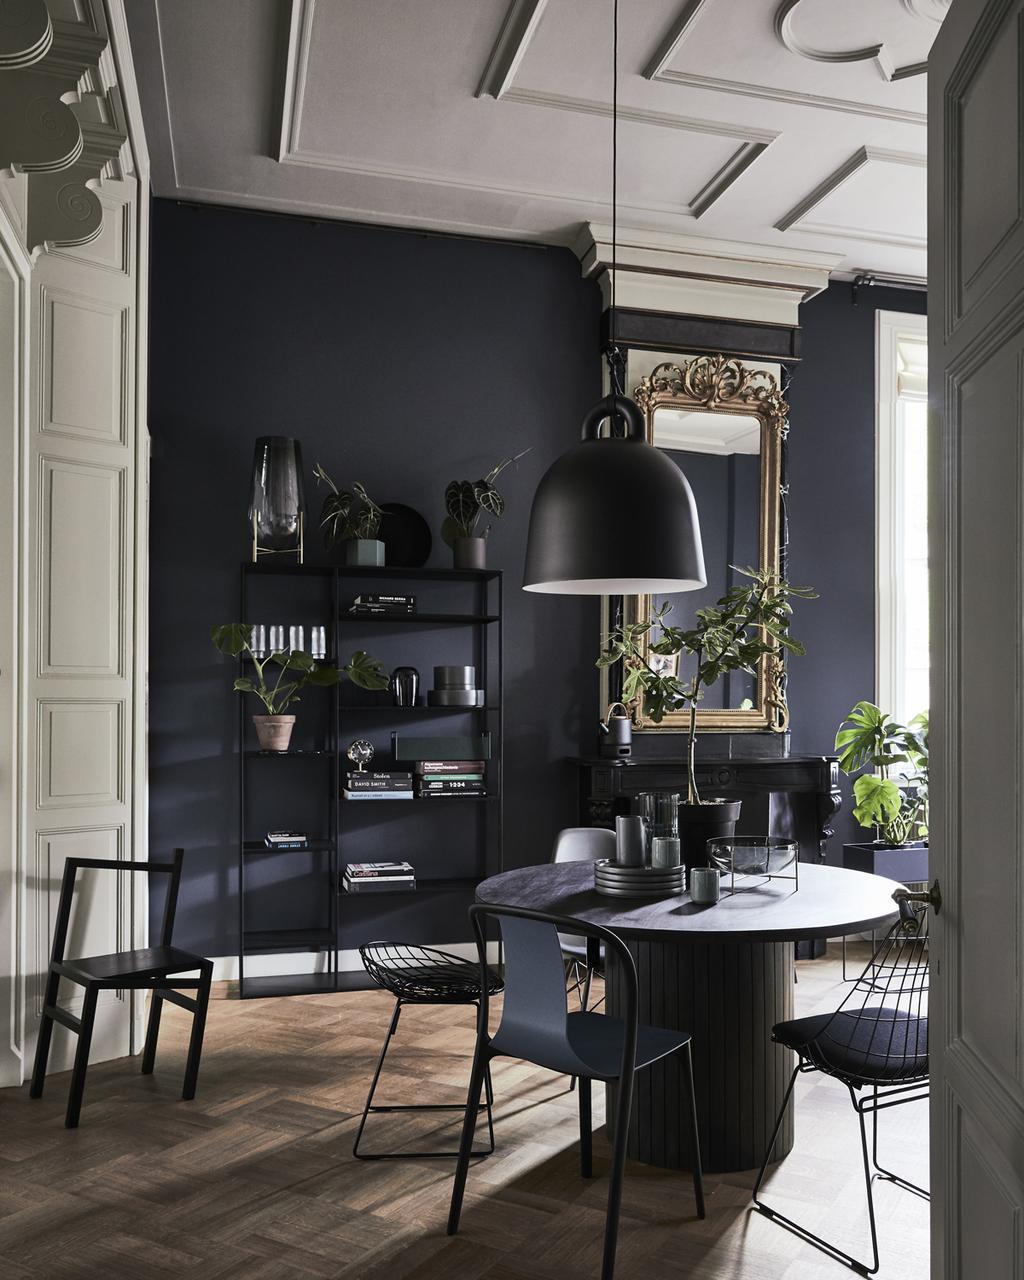 Woonstijl design interieur met donkerblauwe muur en vintage meubels